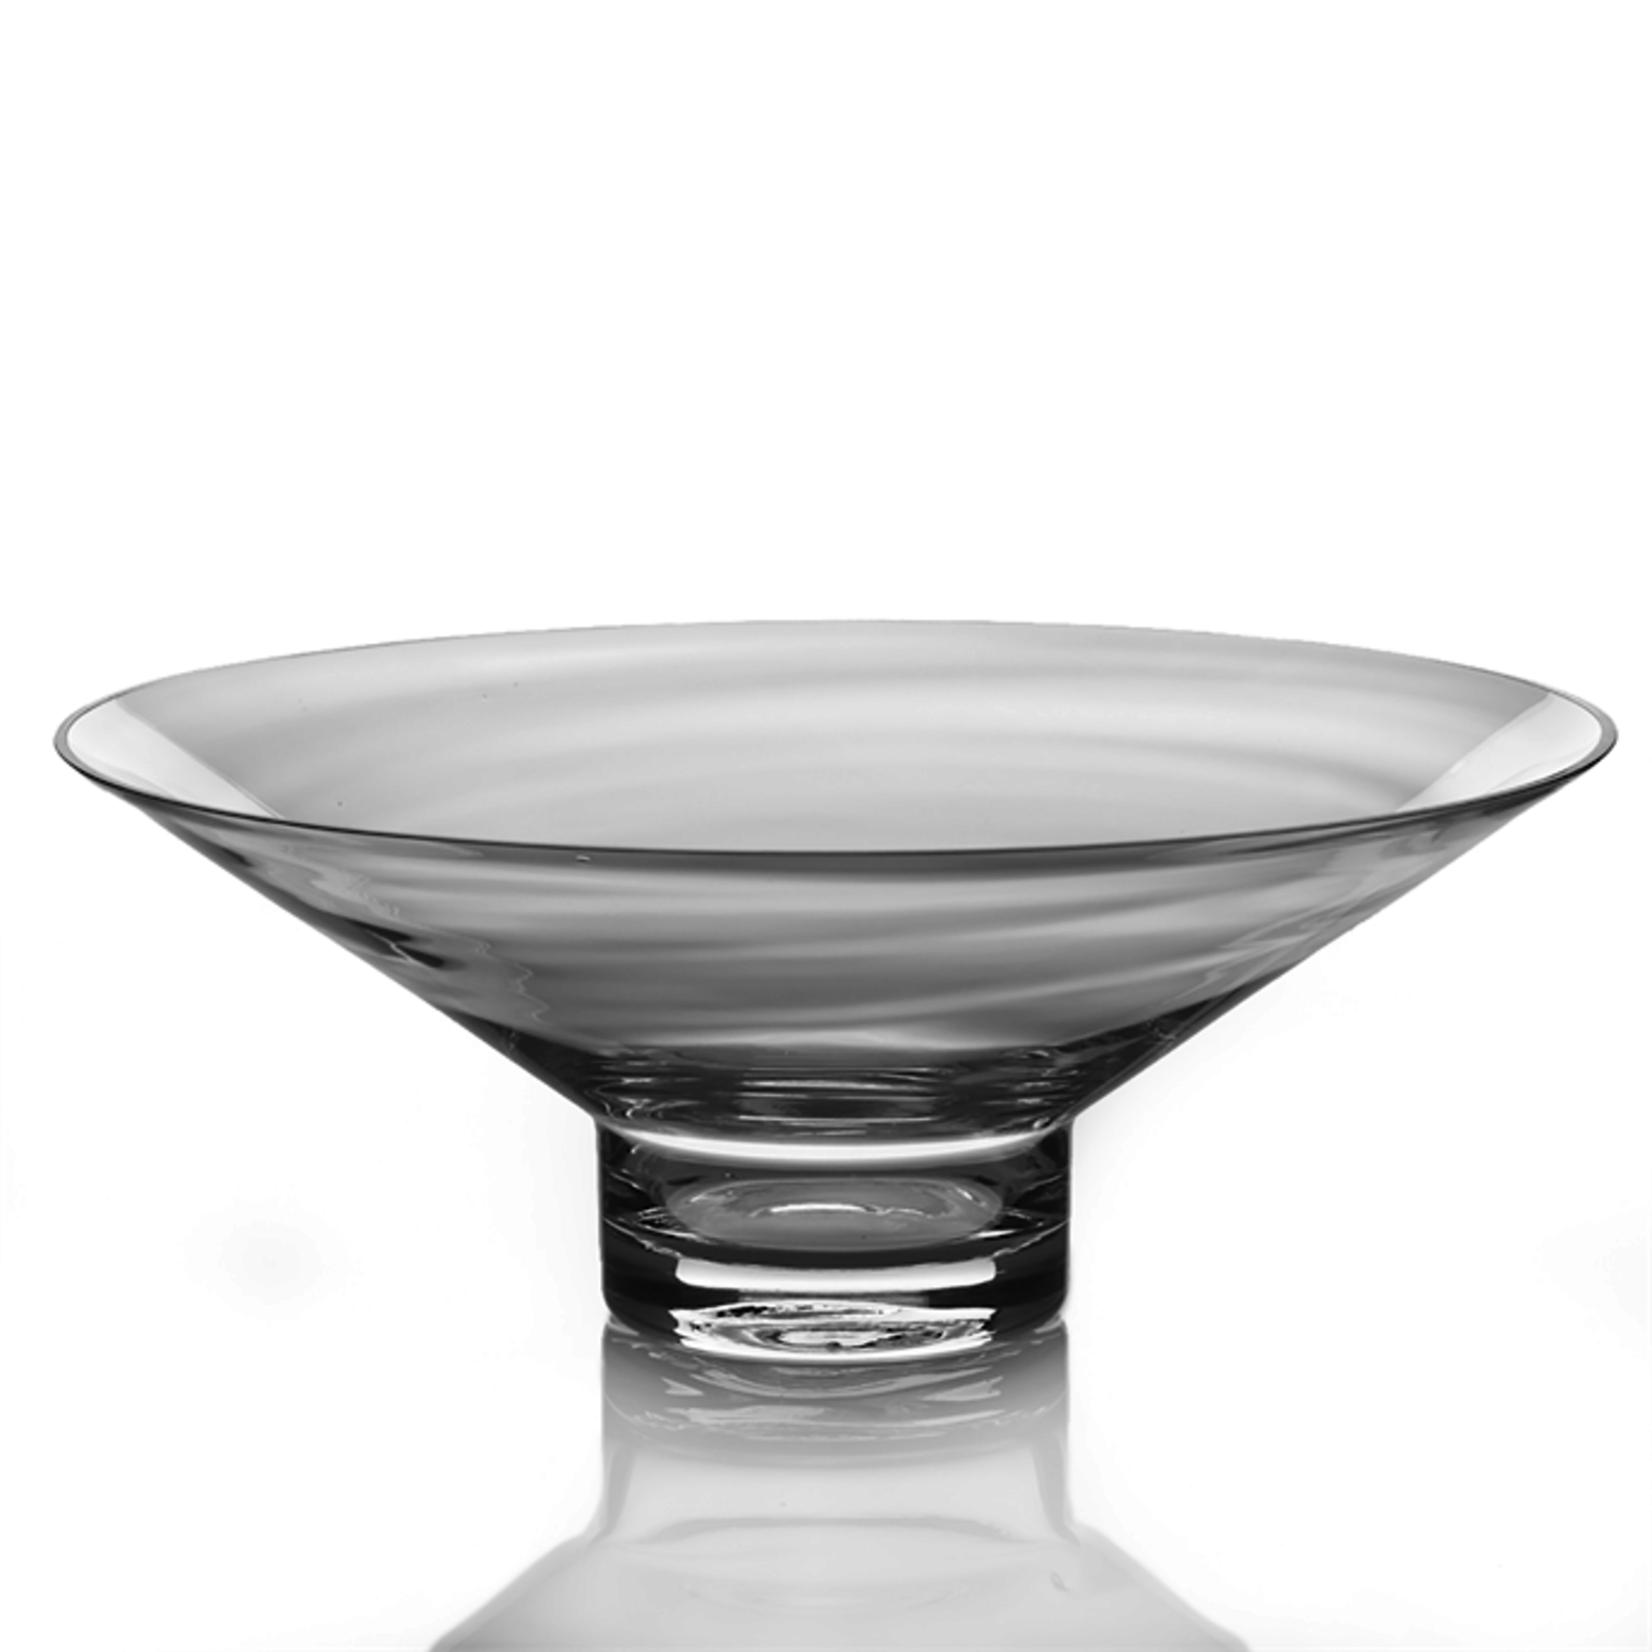 15'' x 5.75'' HARLOW GLASS BOWL